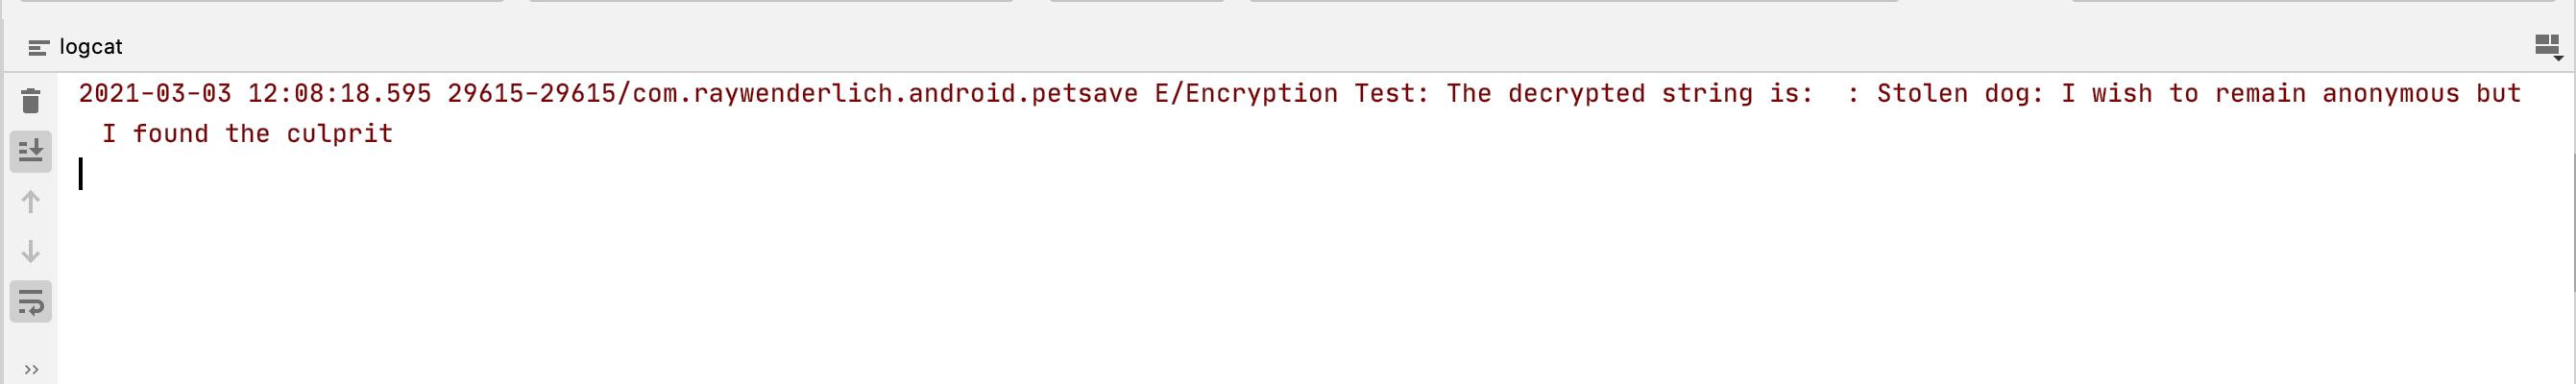 Figure 16.6 — Encryption Test